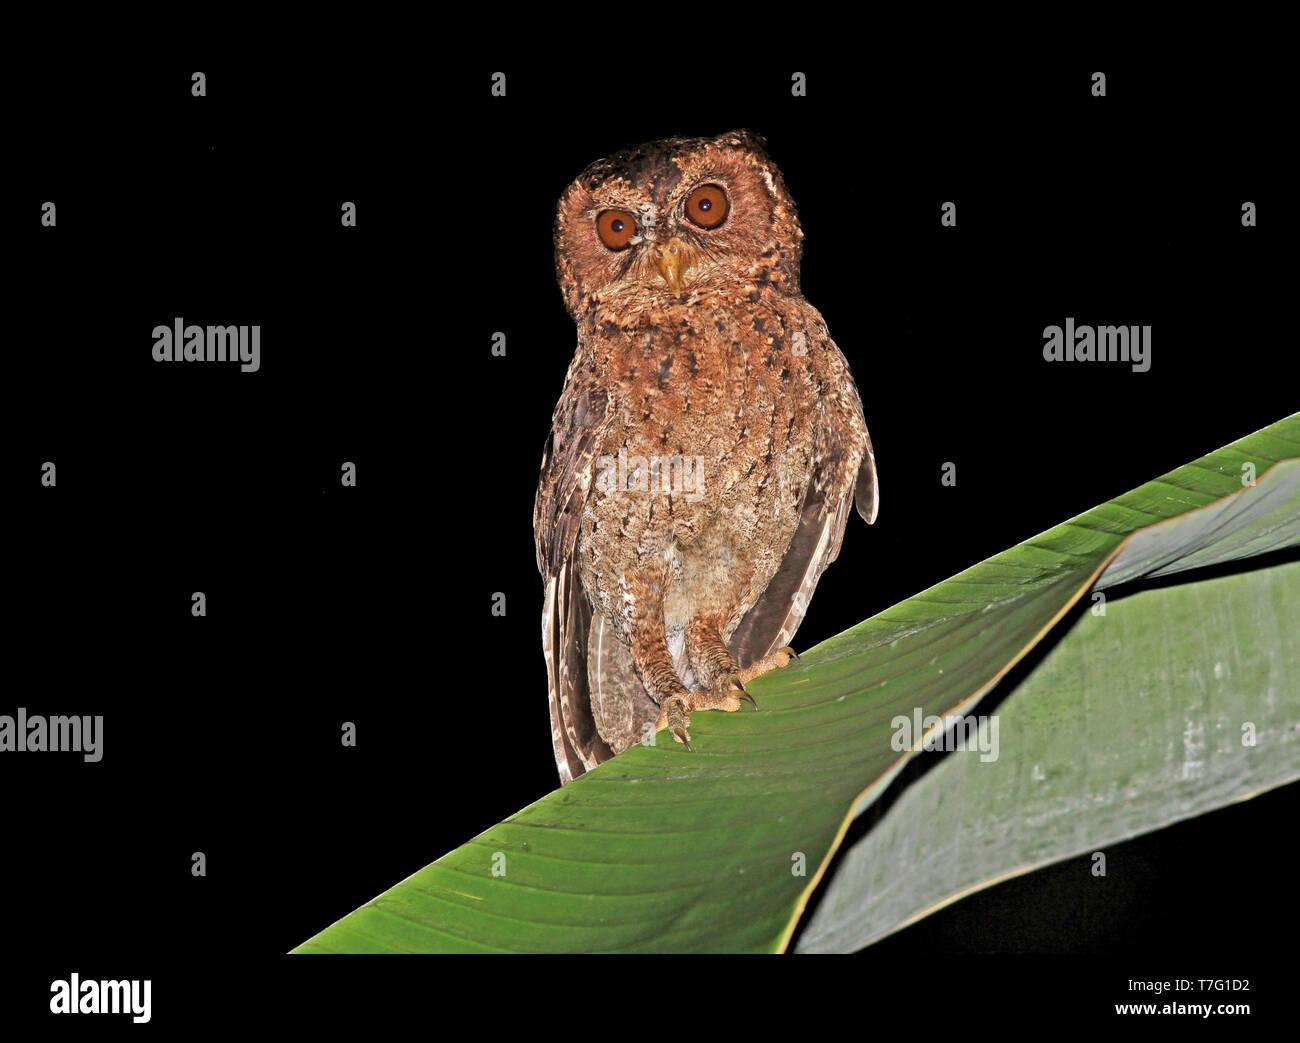 Mentawai Scops-owl (Otus mentawi) at night in rain forests of Sumatra in Indonesia. - Stock Image